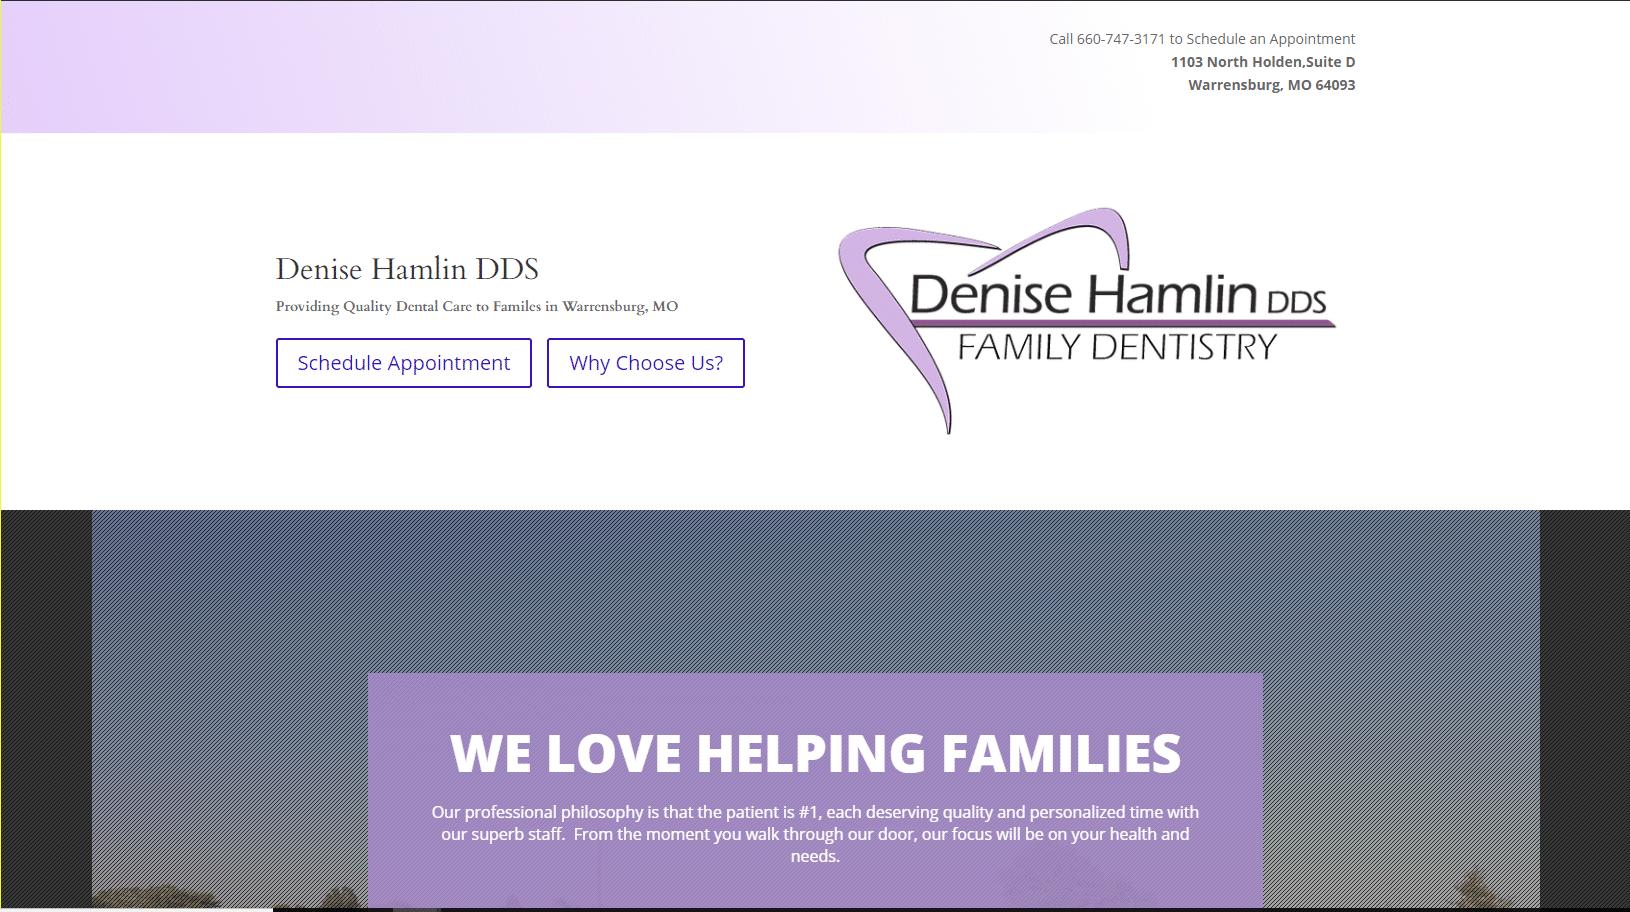 http://denisehamlindds.com